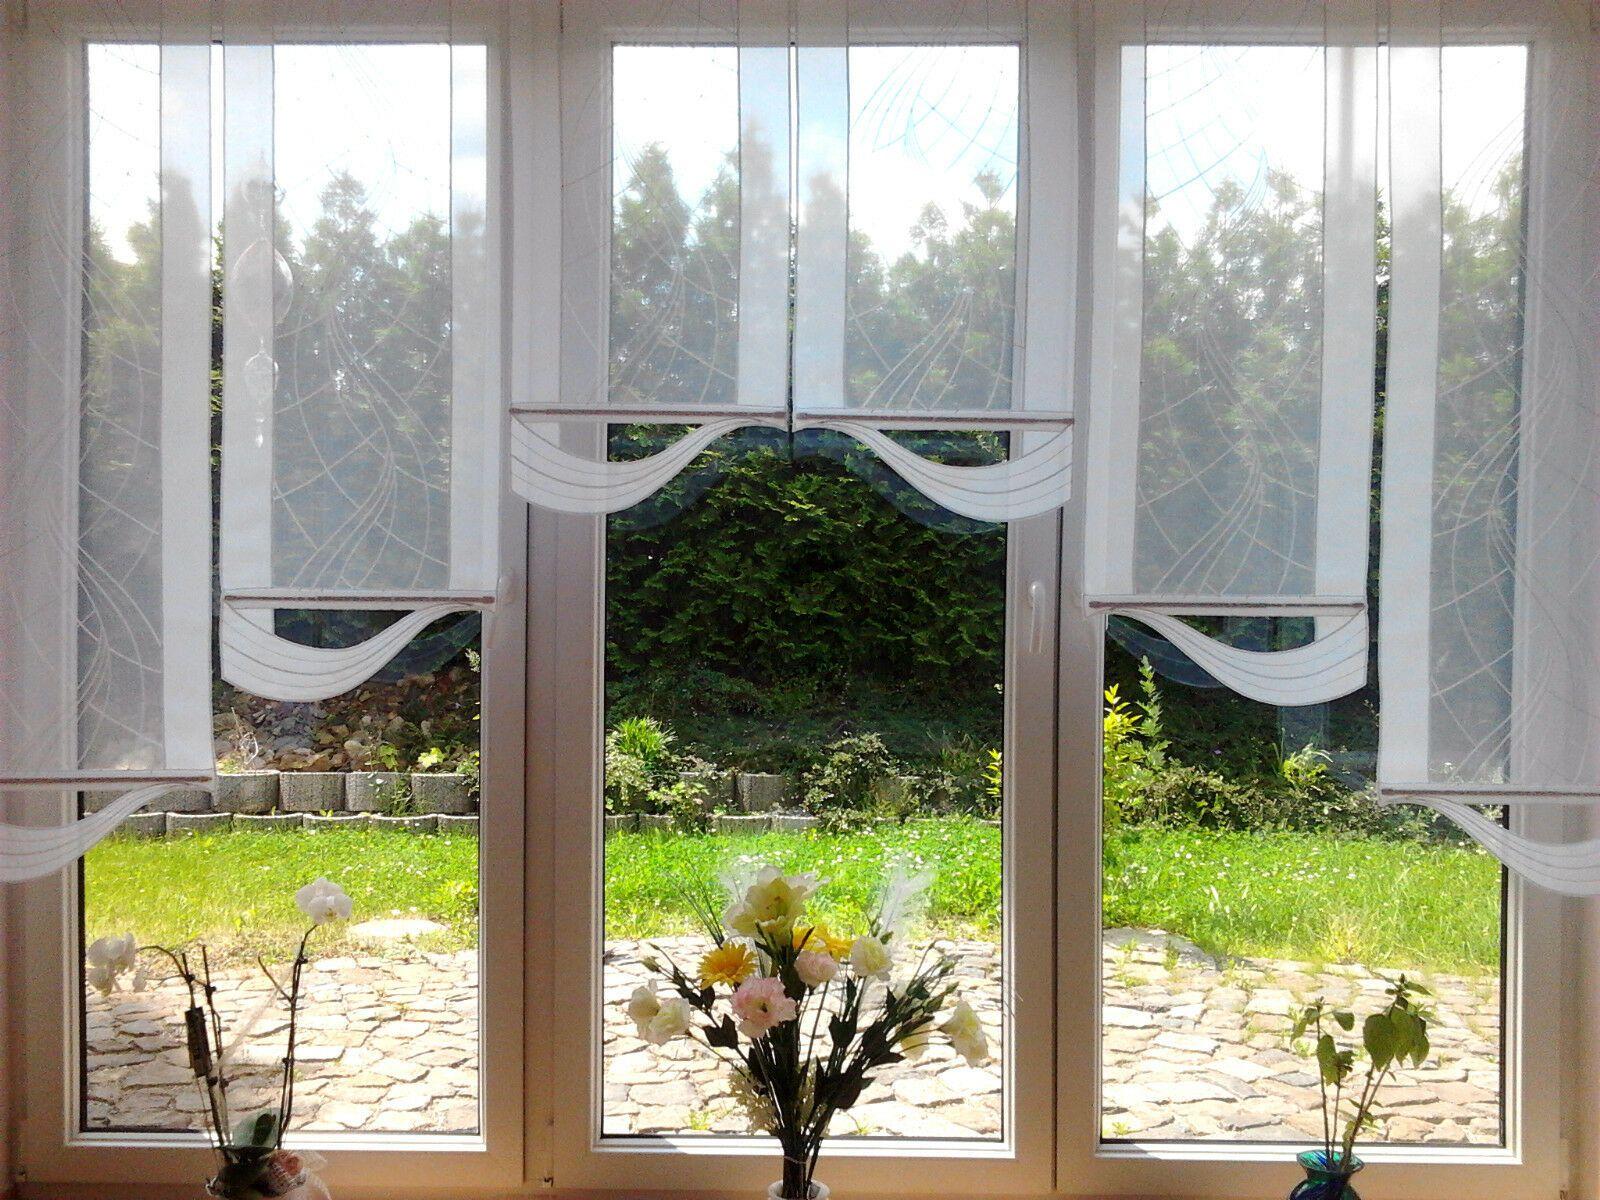 , Schiebegardinen Für Kurze Fenster, Carles Pen, Carles Pen